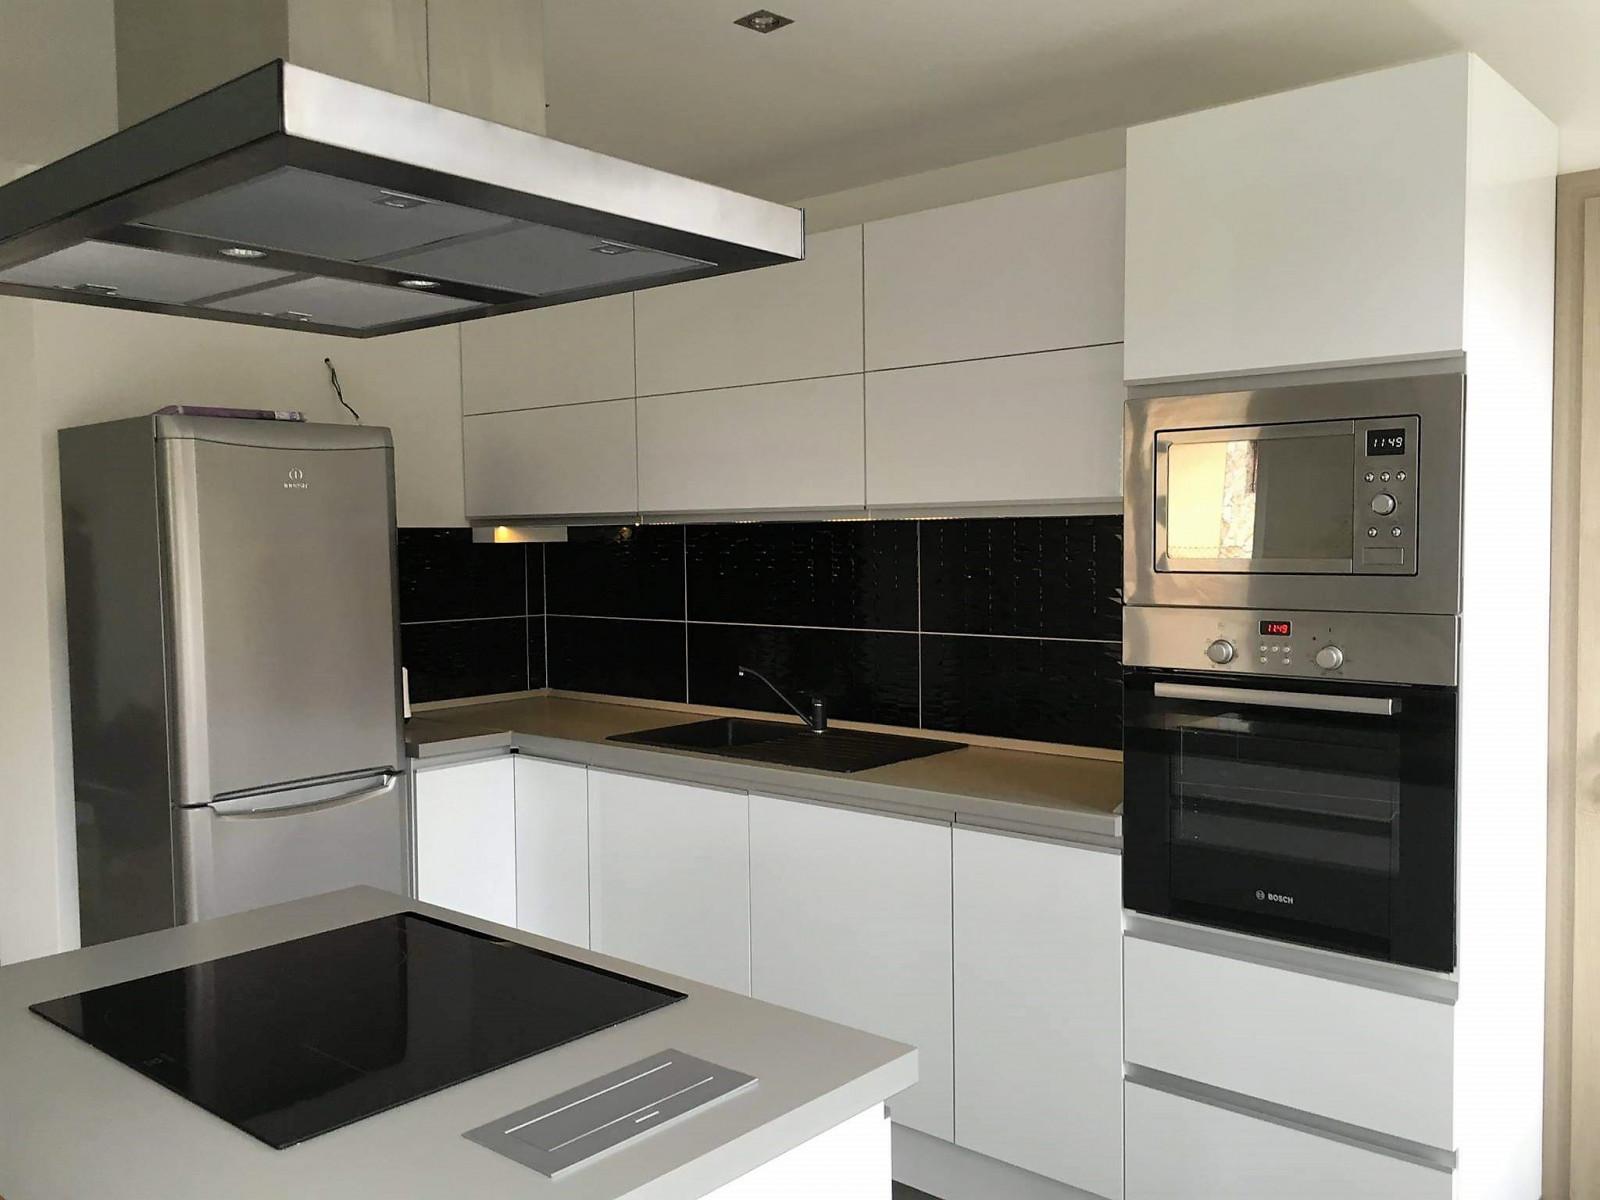 Fehér rejtett fogantyús modern konyha konyhaszigettel